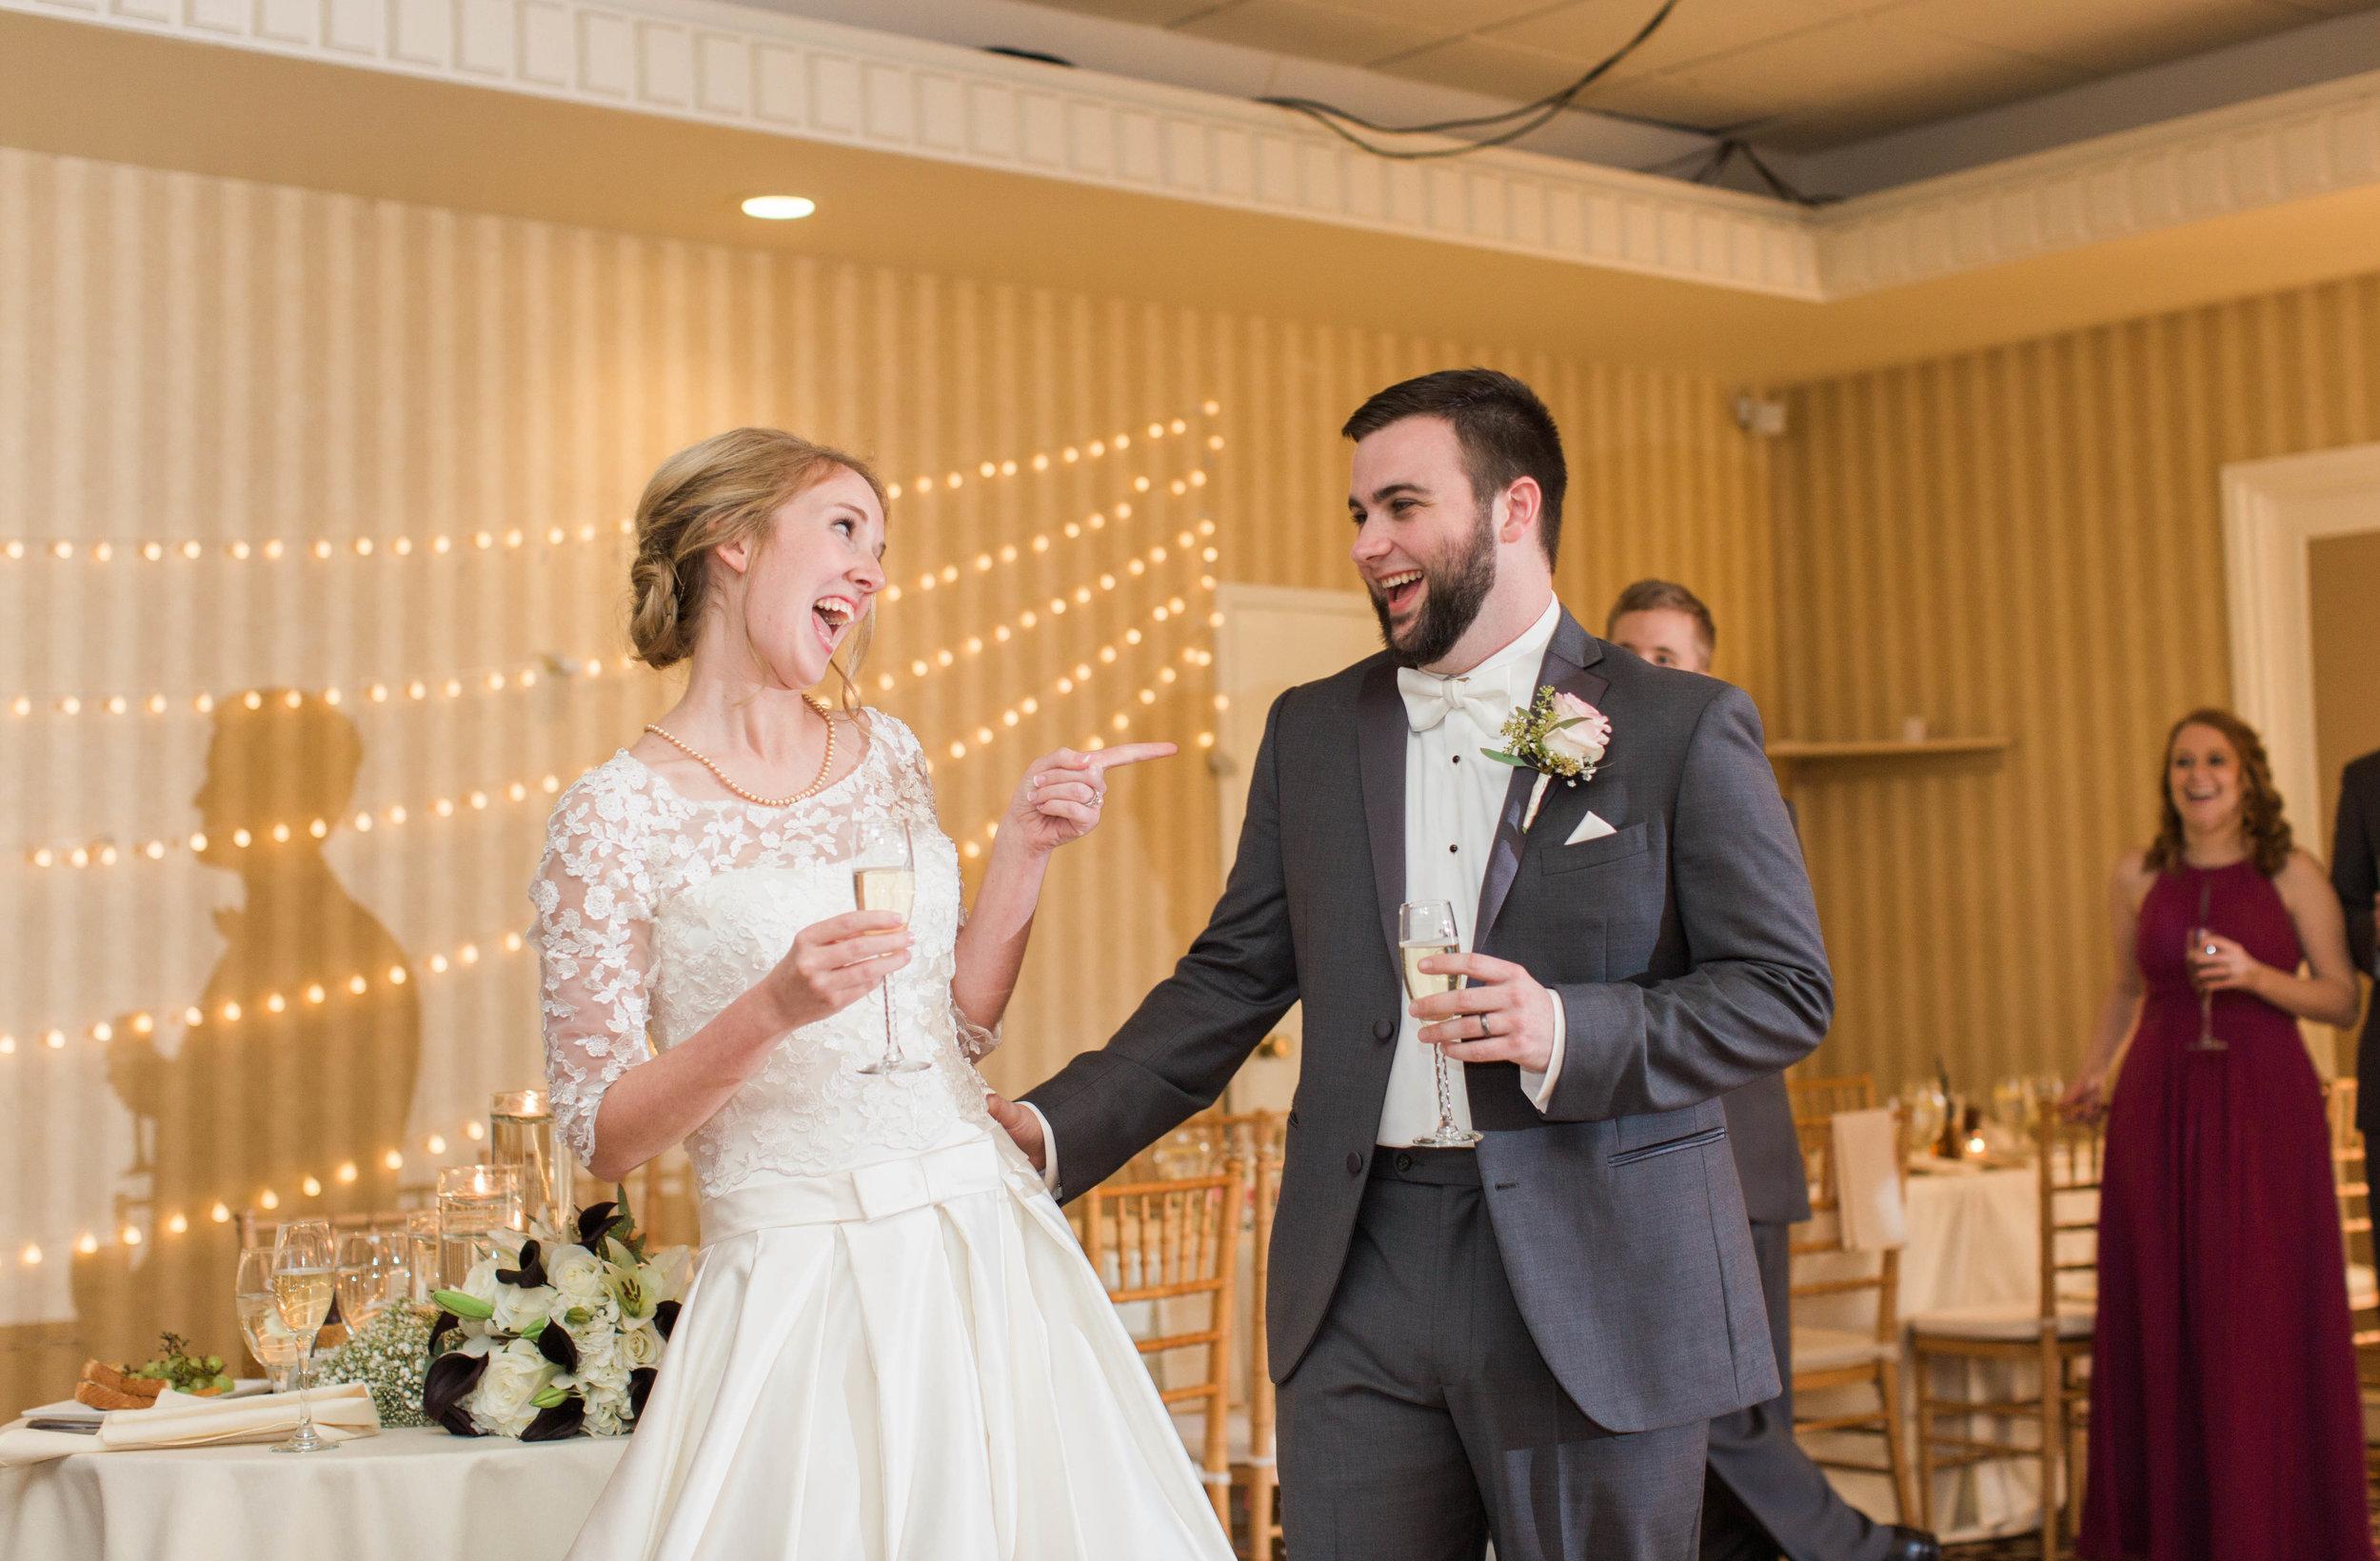 Beaumont Texas Country Club wedding-6218.jpg